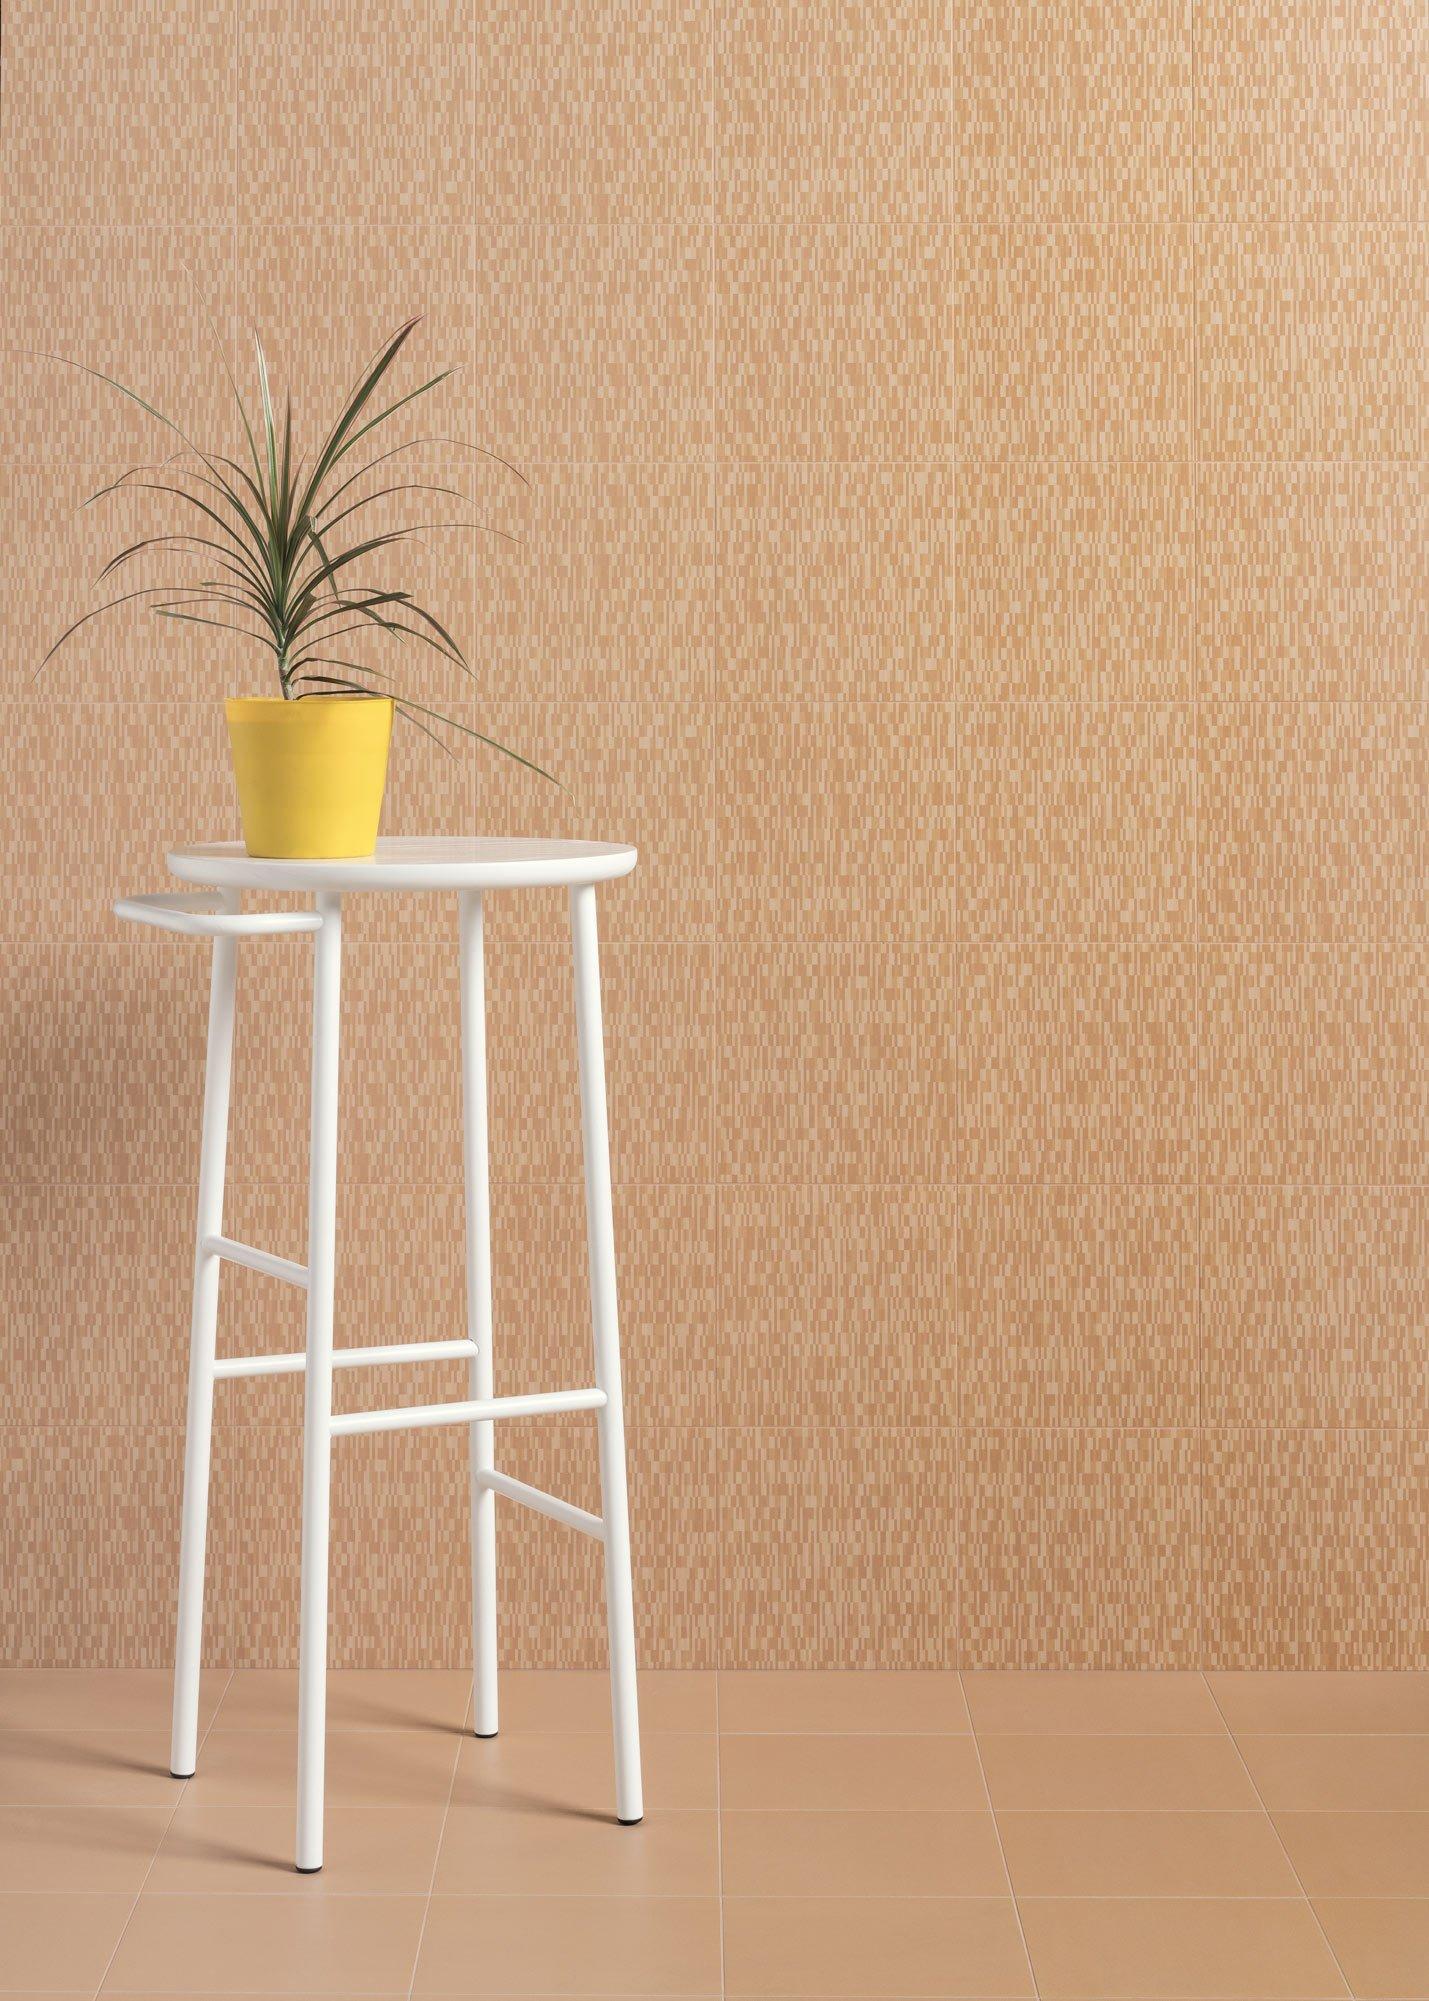 "Wall Sunday Tessellate Terra 20x20 8""x8"" - Floor Sunday Terra 20x20 8""x8"""